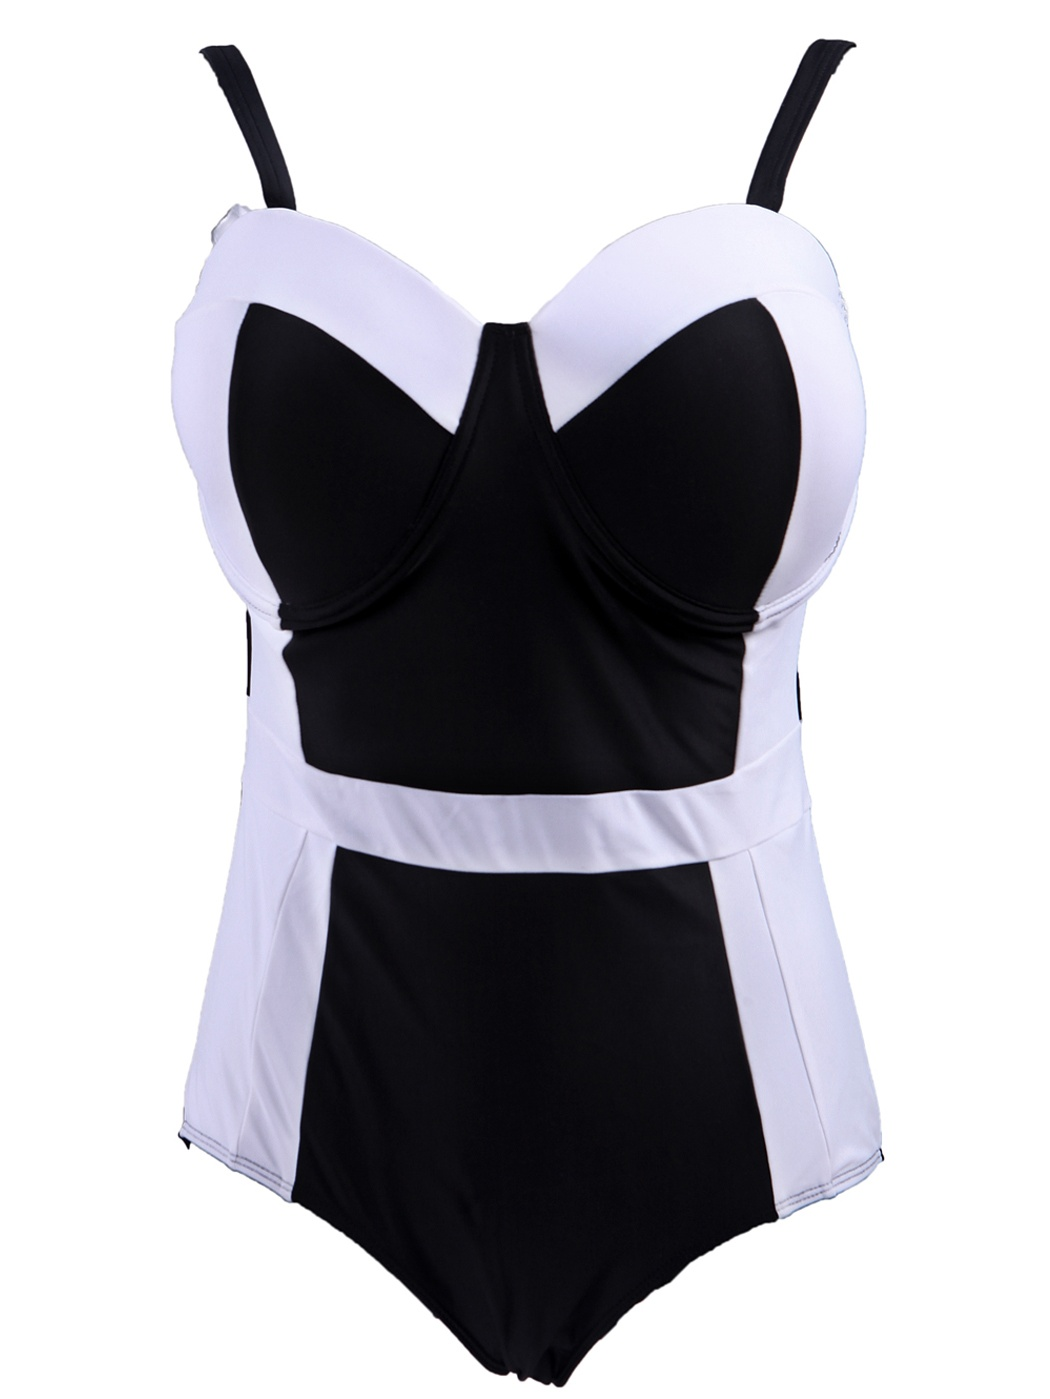 Women's Retro One Piece Swimsuit Plus Size Padded Halter Vintage Swimsuit (Black-White Monokini, XX-Large)